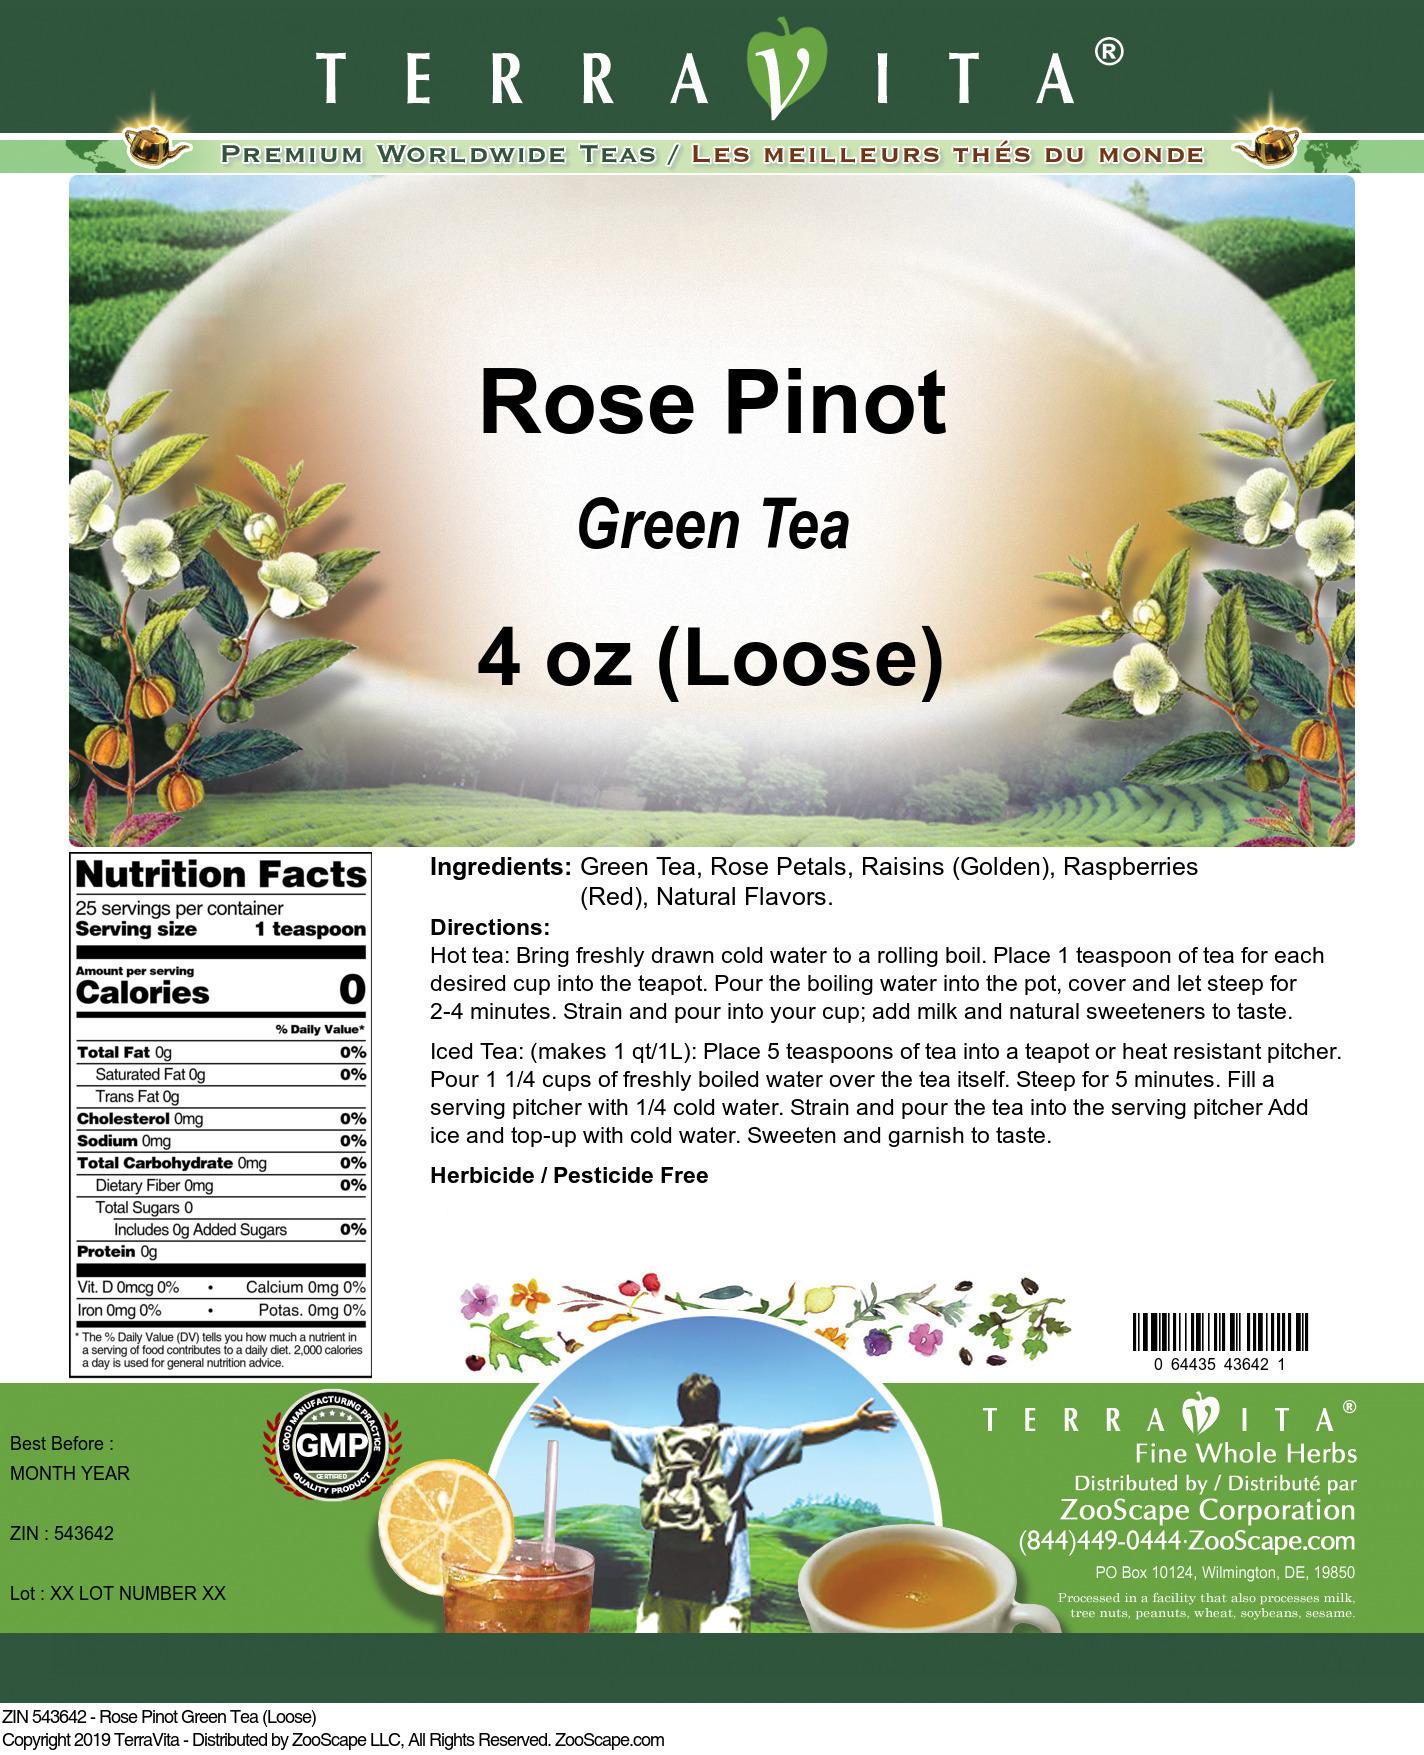 Rose Pinot Green Tea